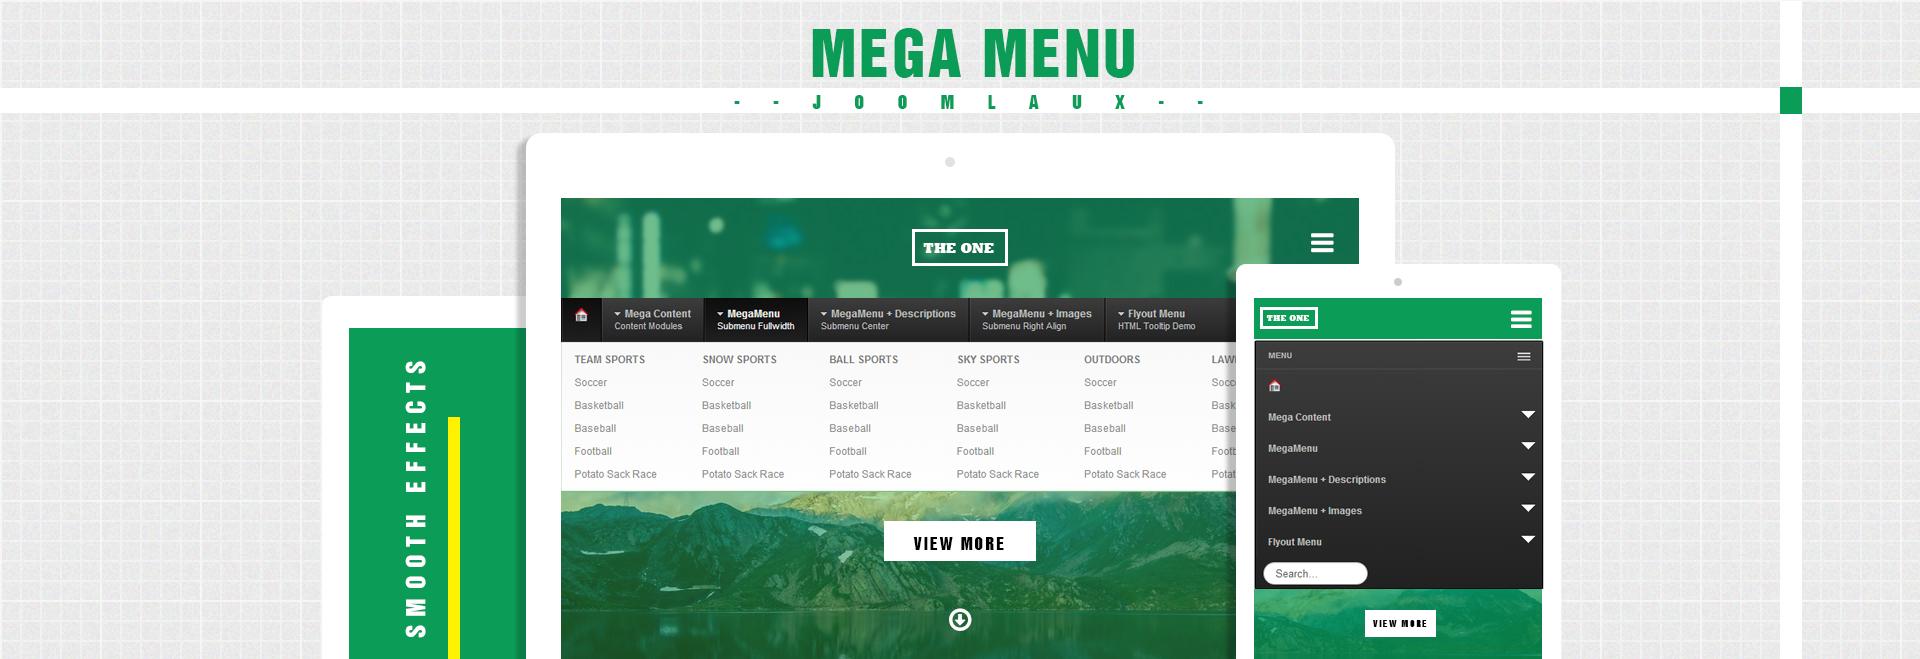 Vertical menu joomla template template : 2018